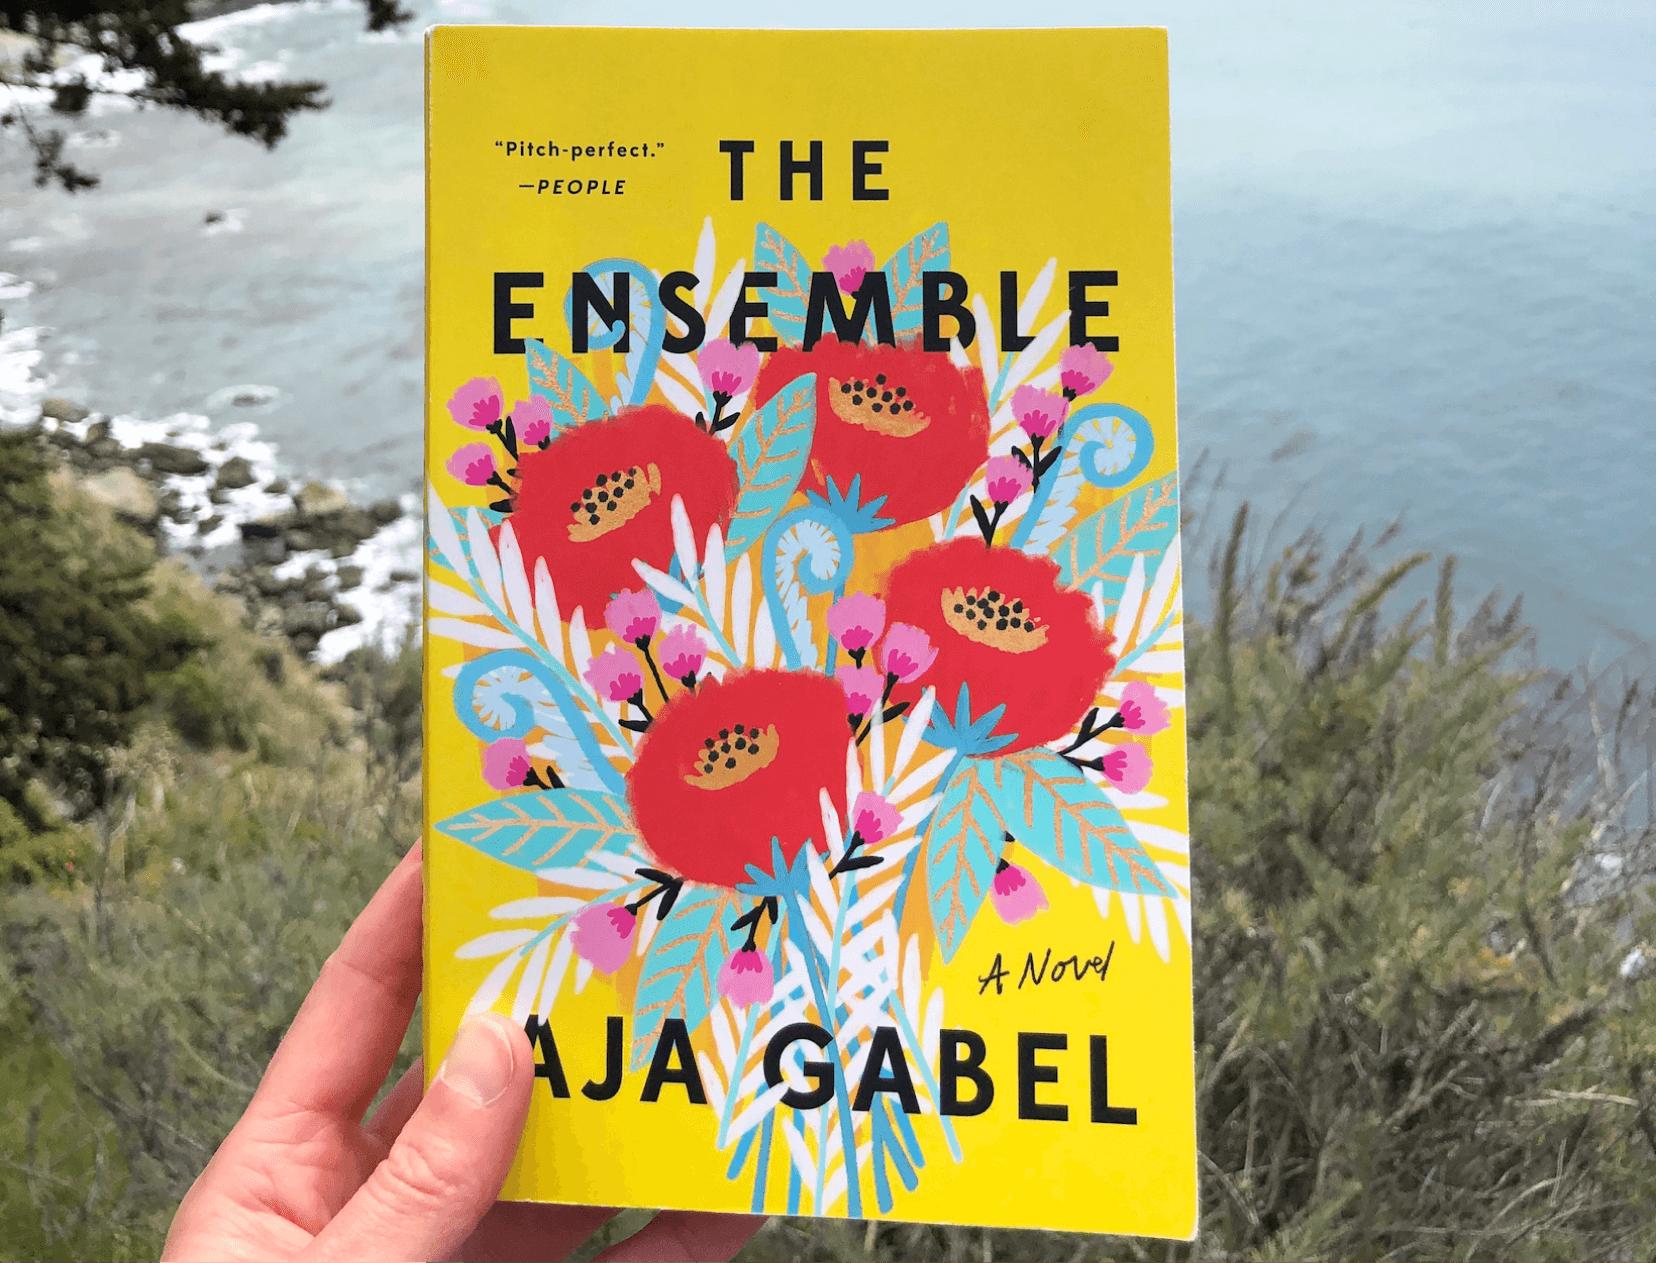 Aja Gabel The Ensemble